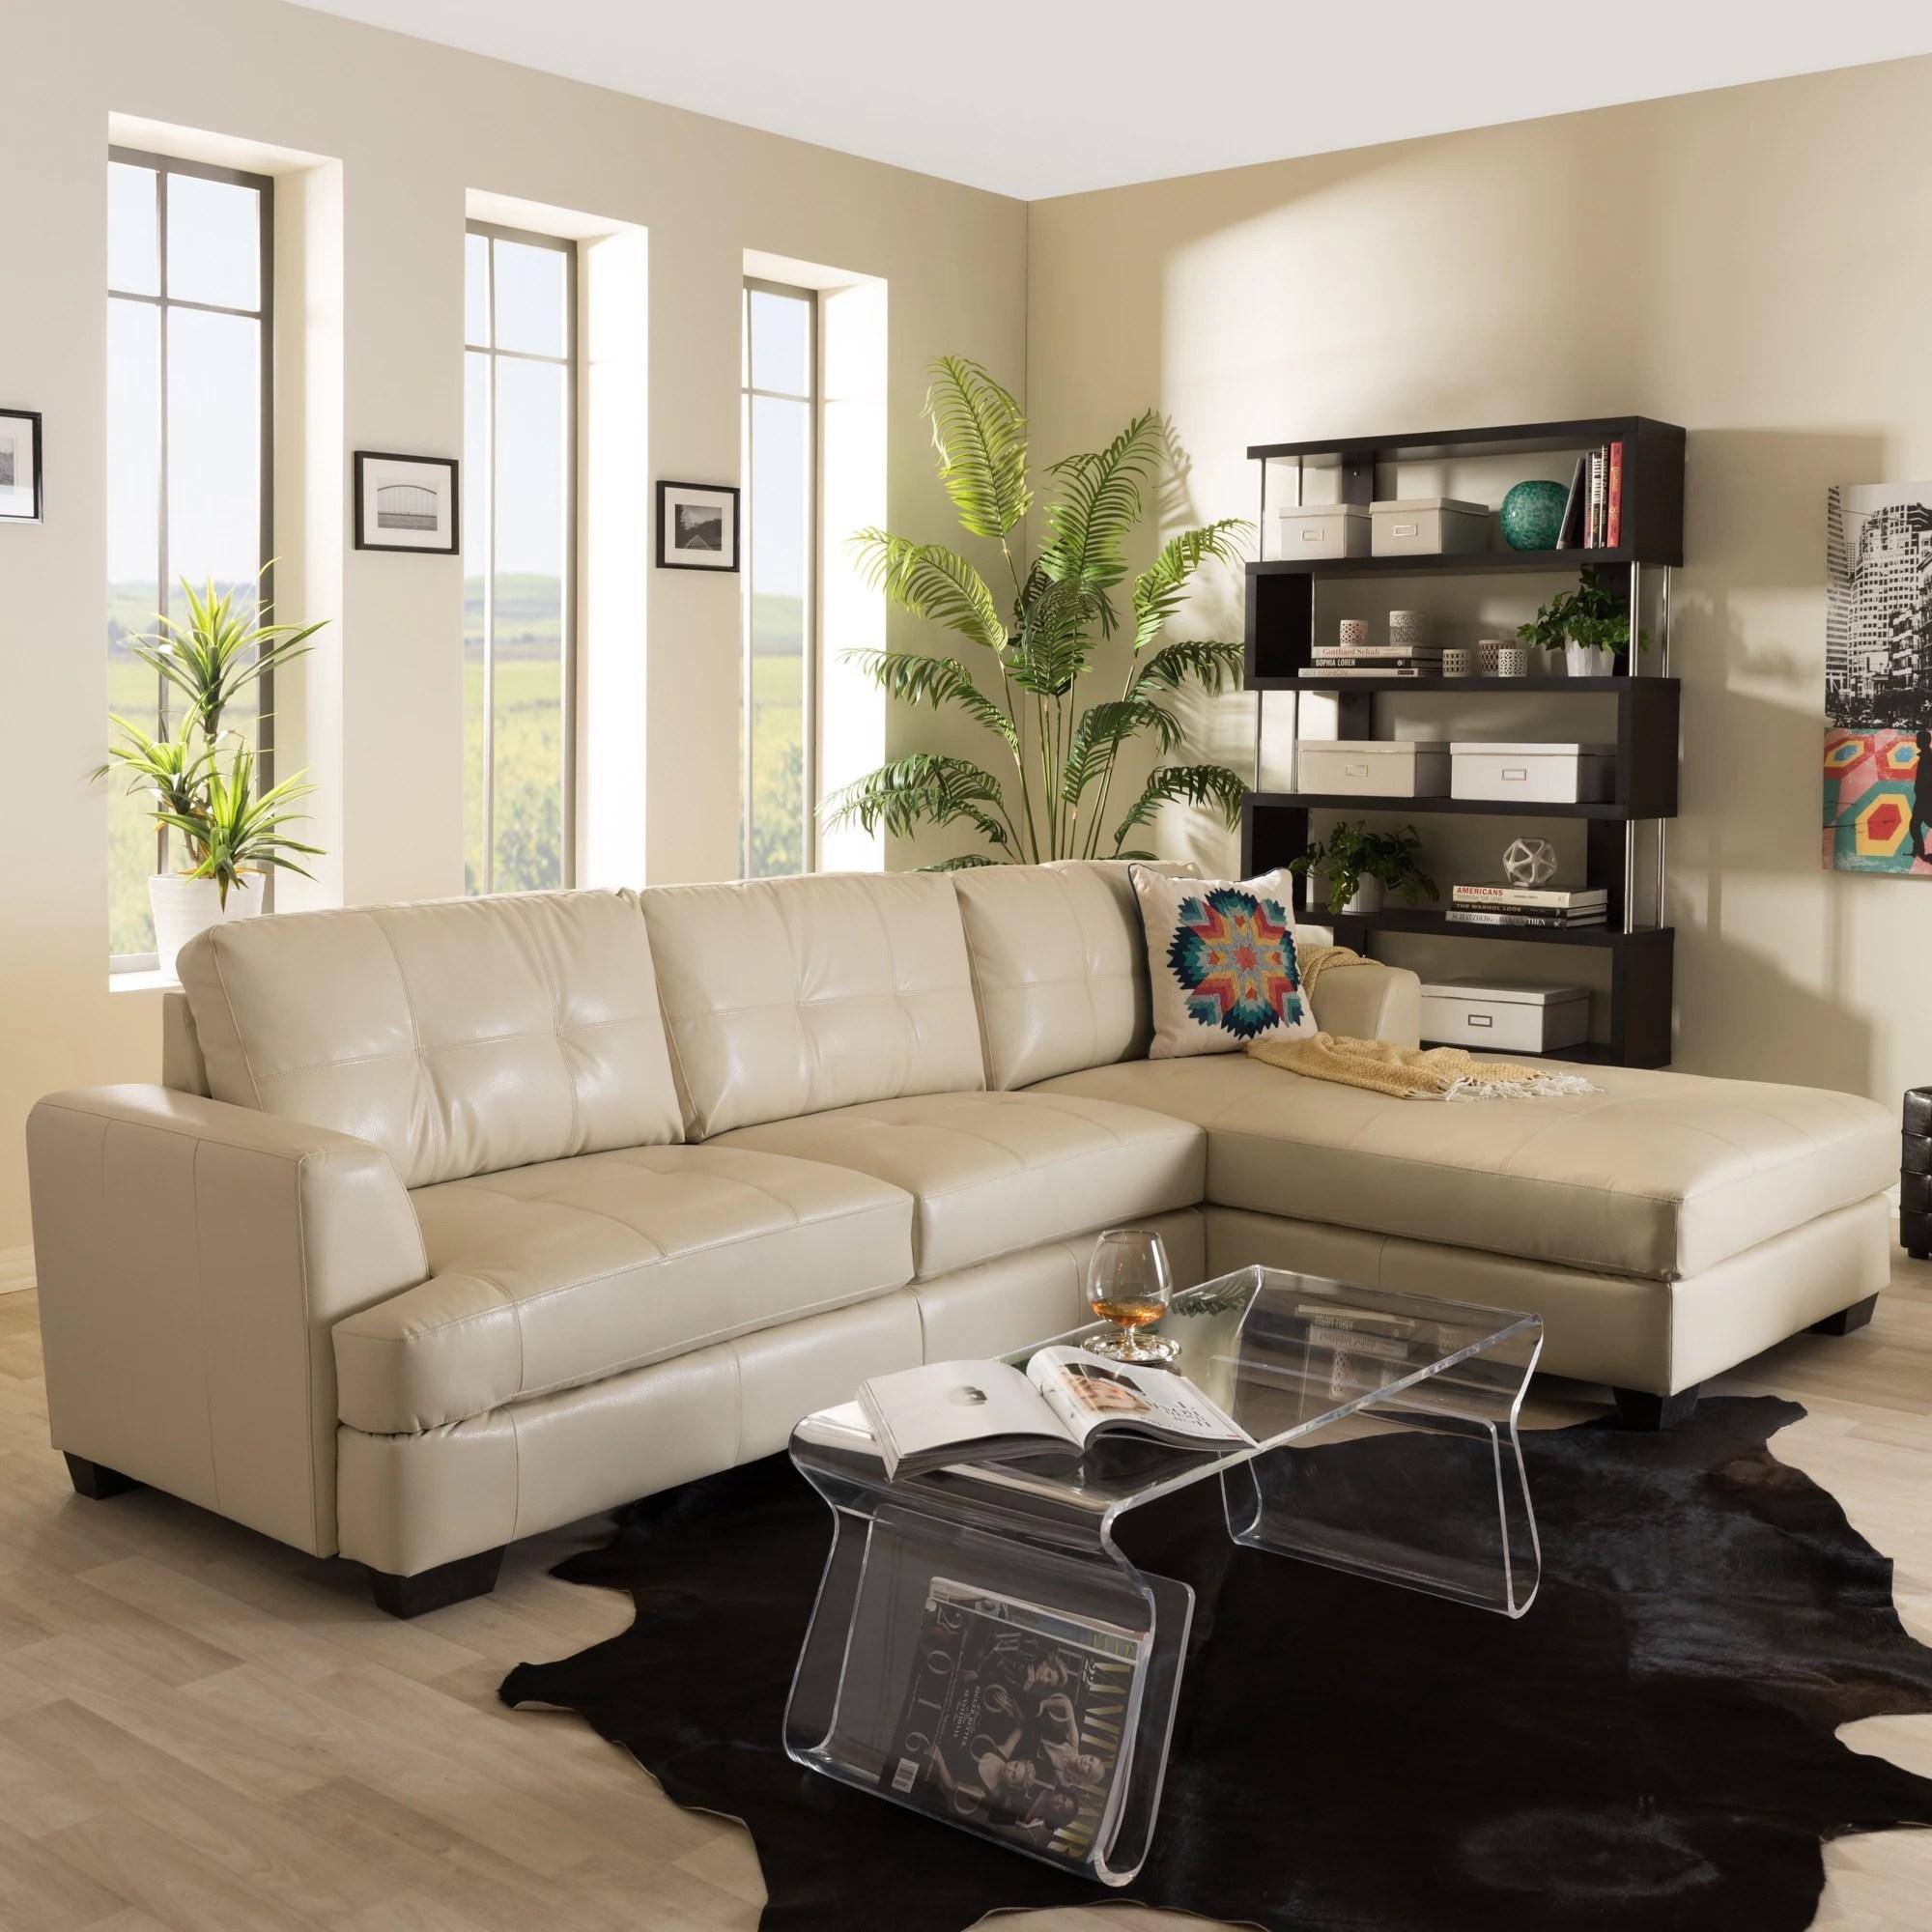 baxton studio dobson modern cream bonded leather tufted sectional sofa